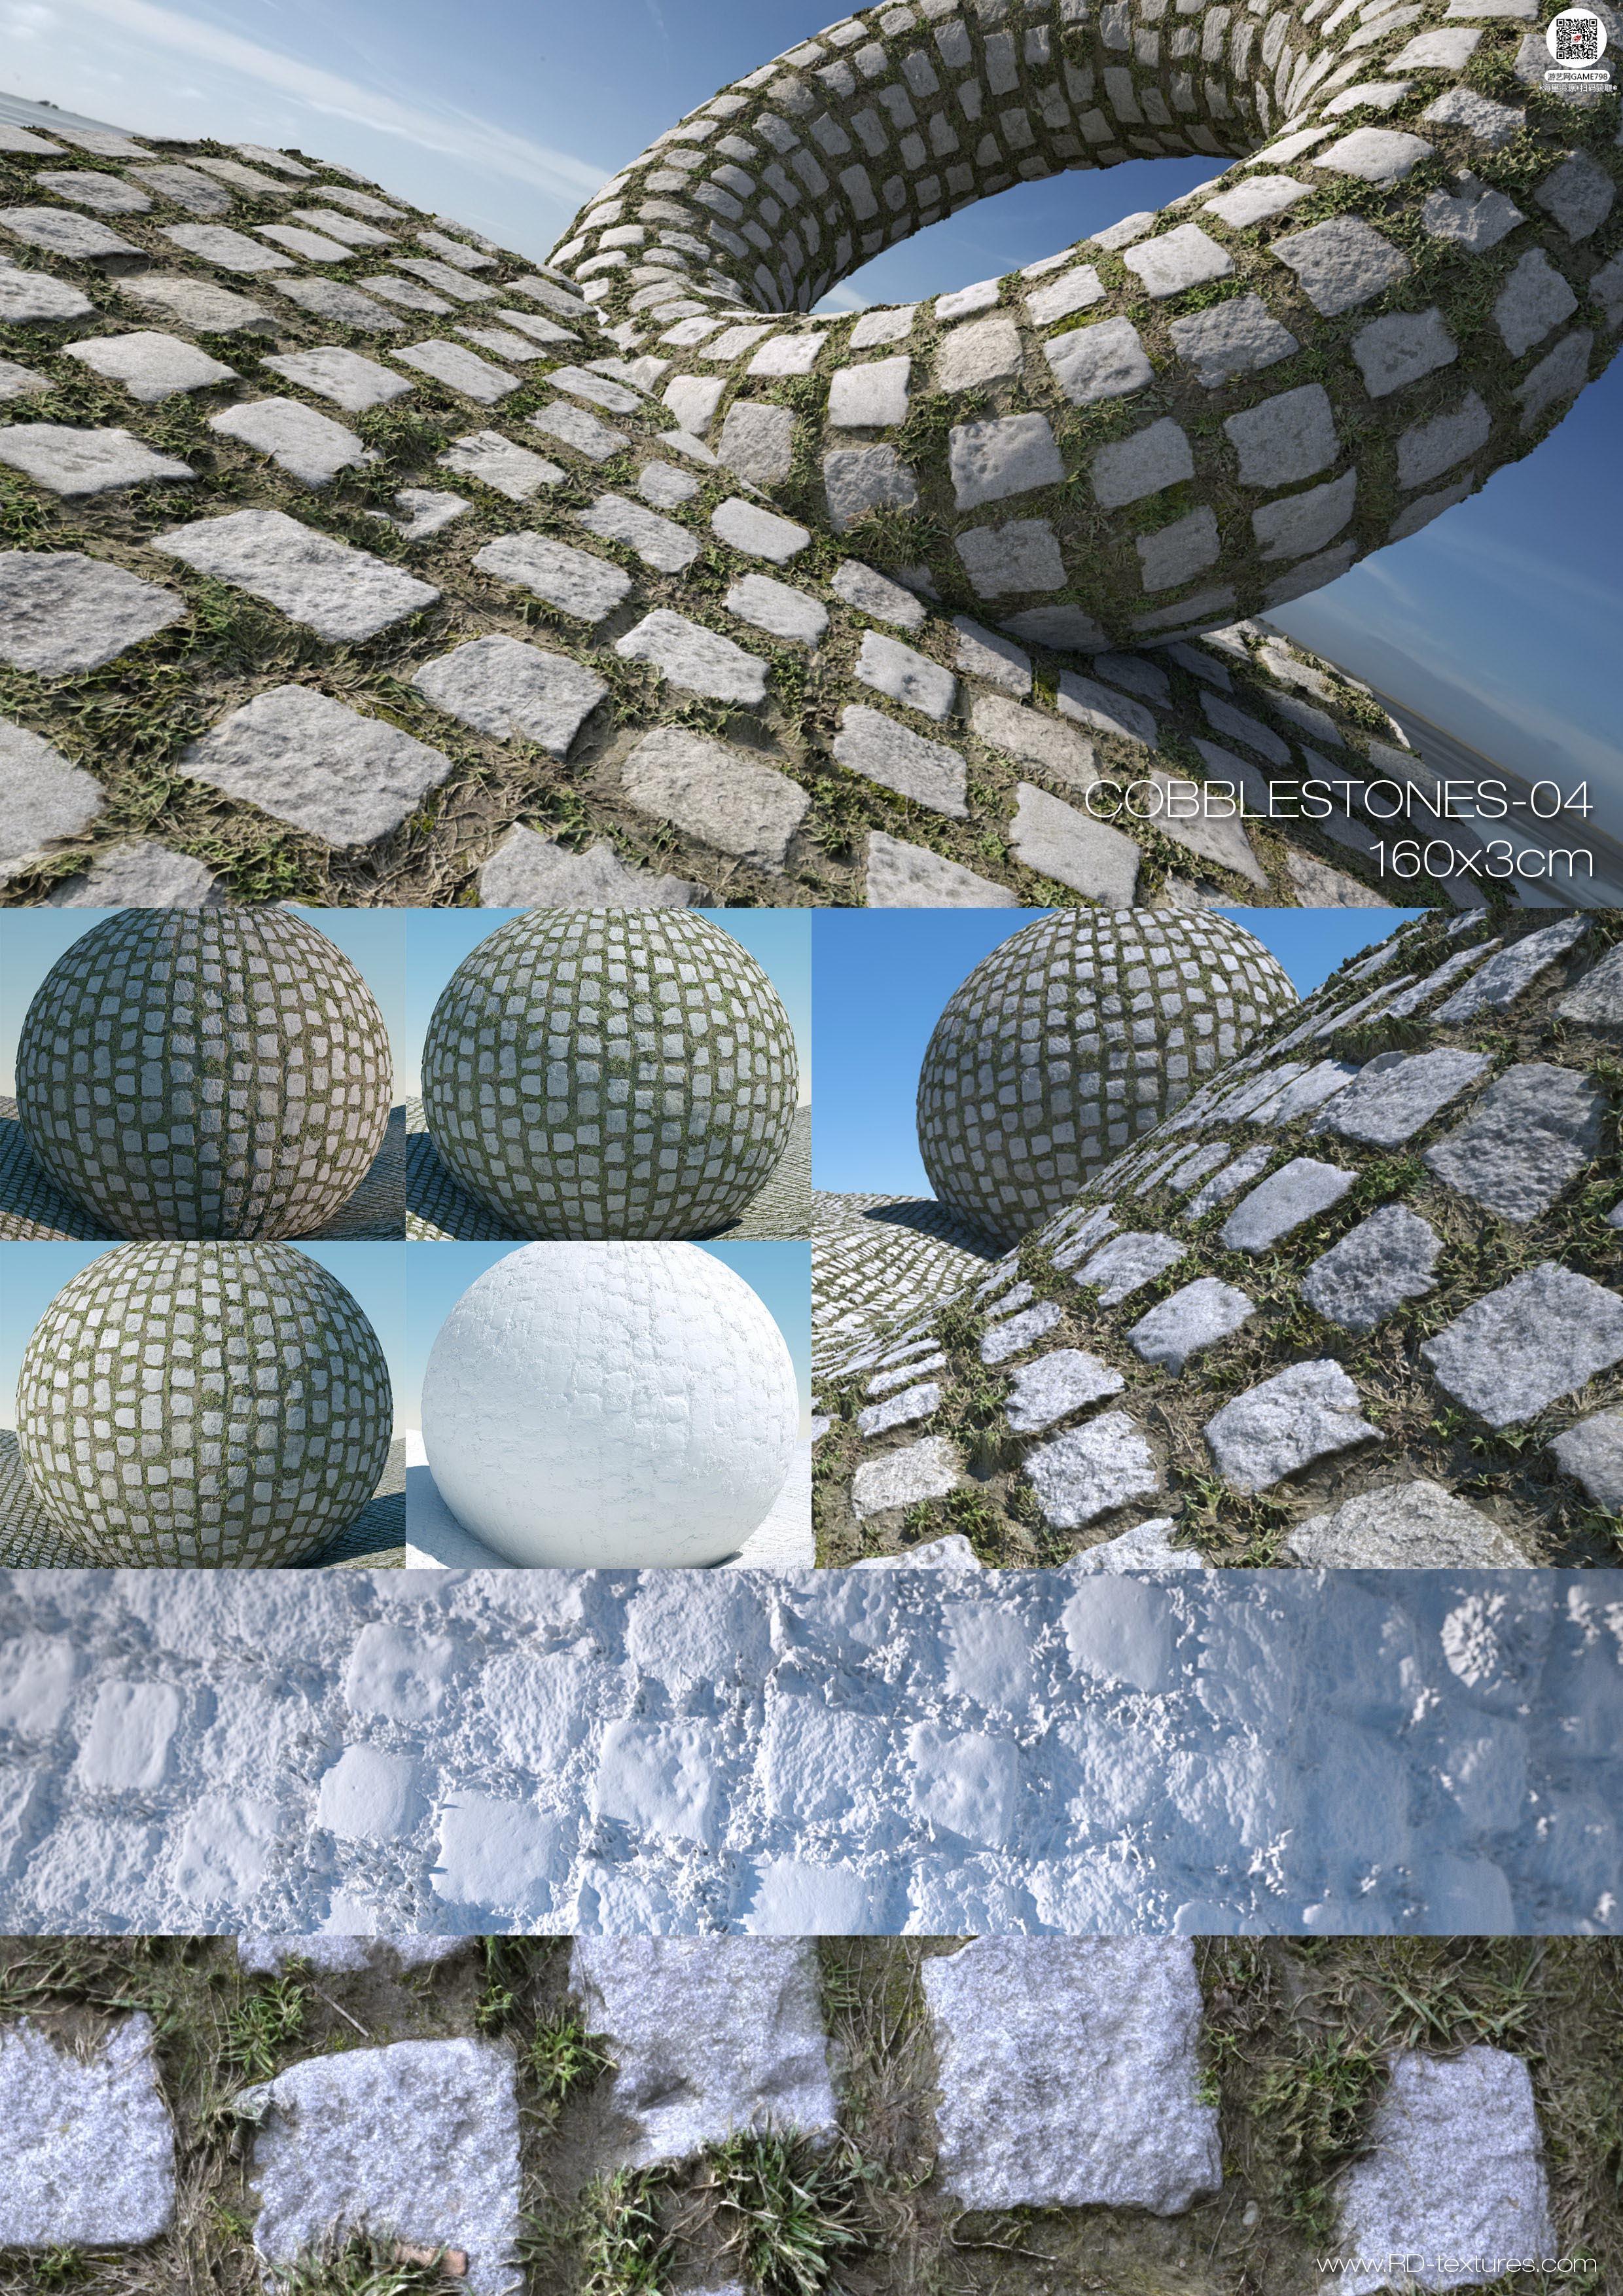 COBBLESTONES-04_160x3cm.jpg